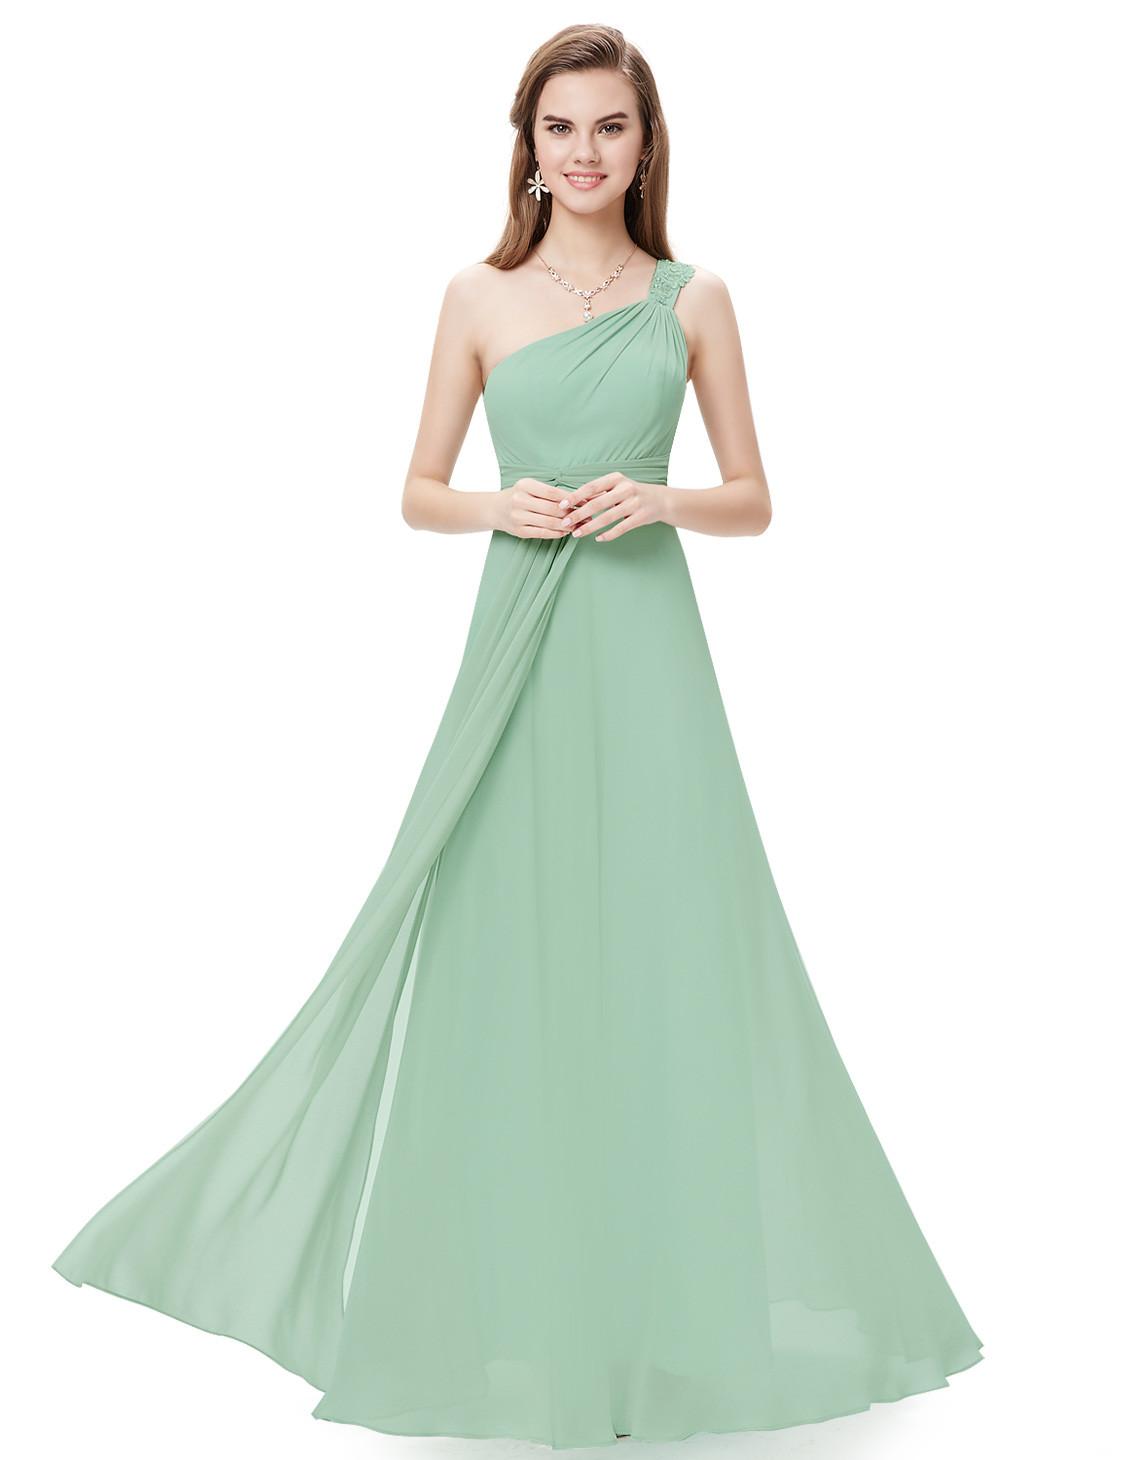 Sage Green Sage Flowers One Shoulder Rhinestone Bridesmaid Dress